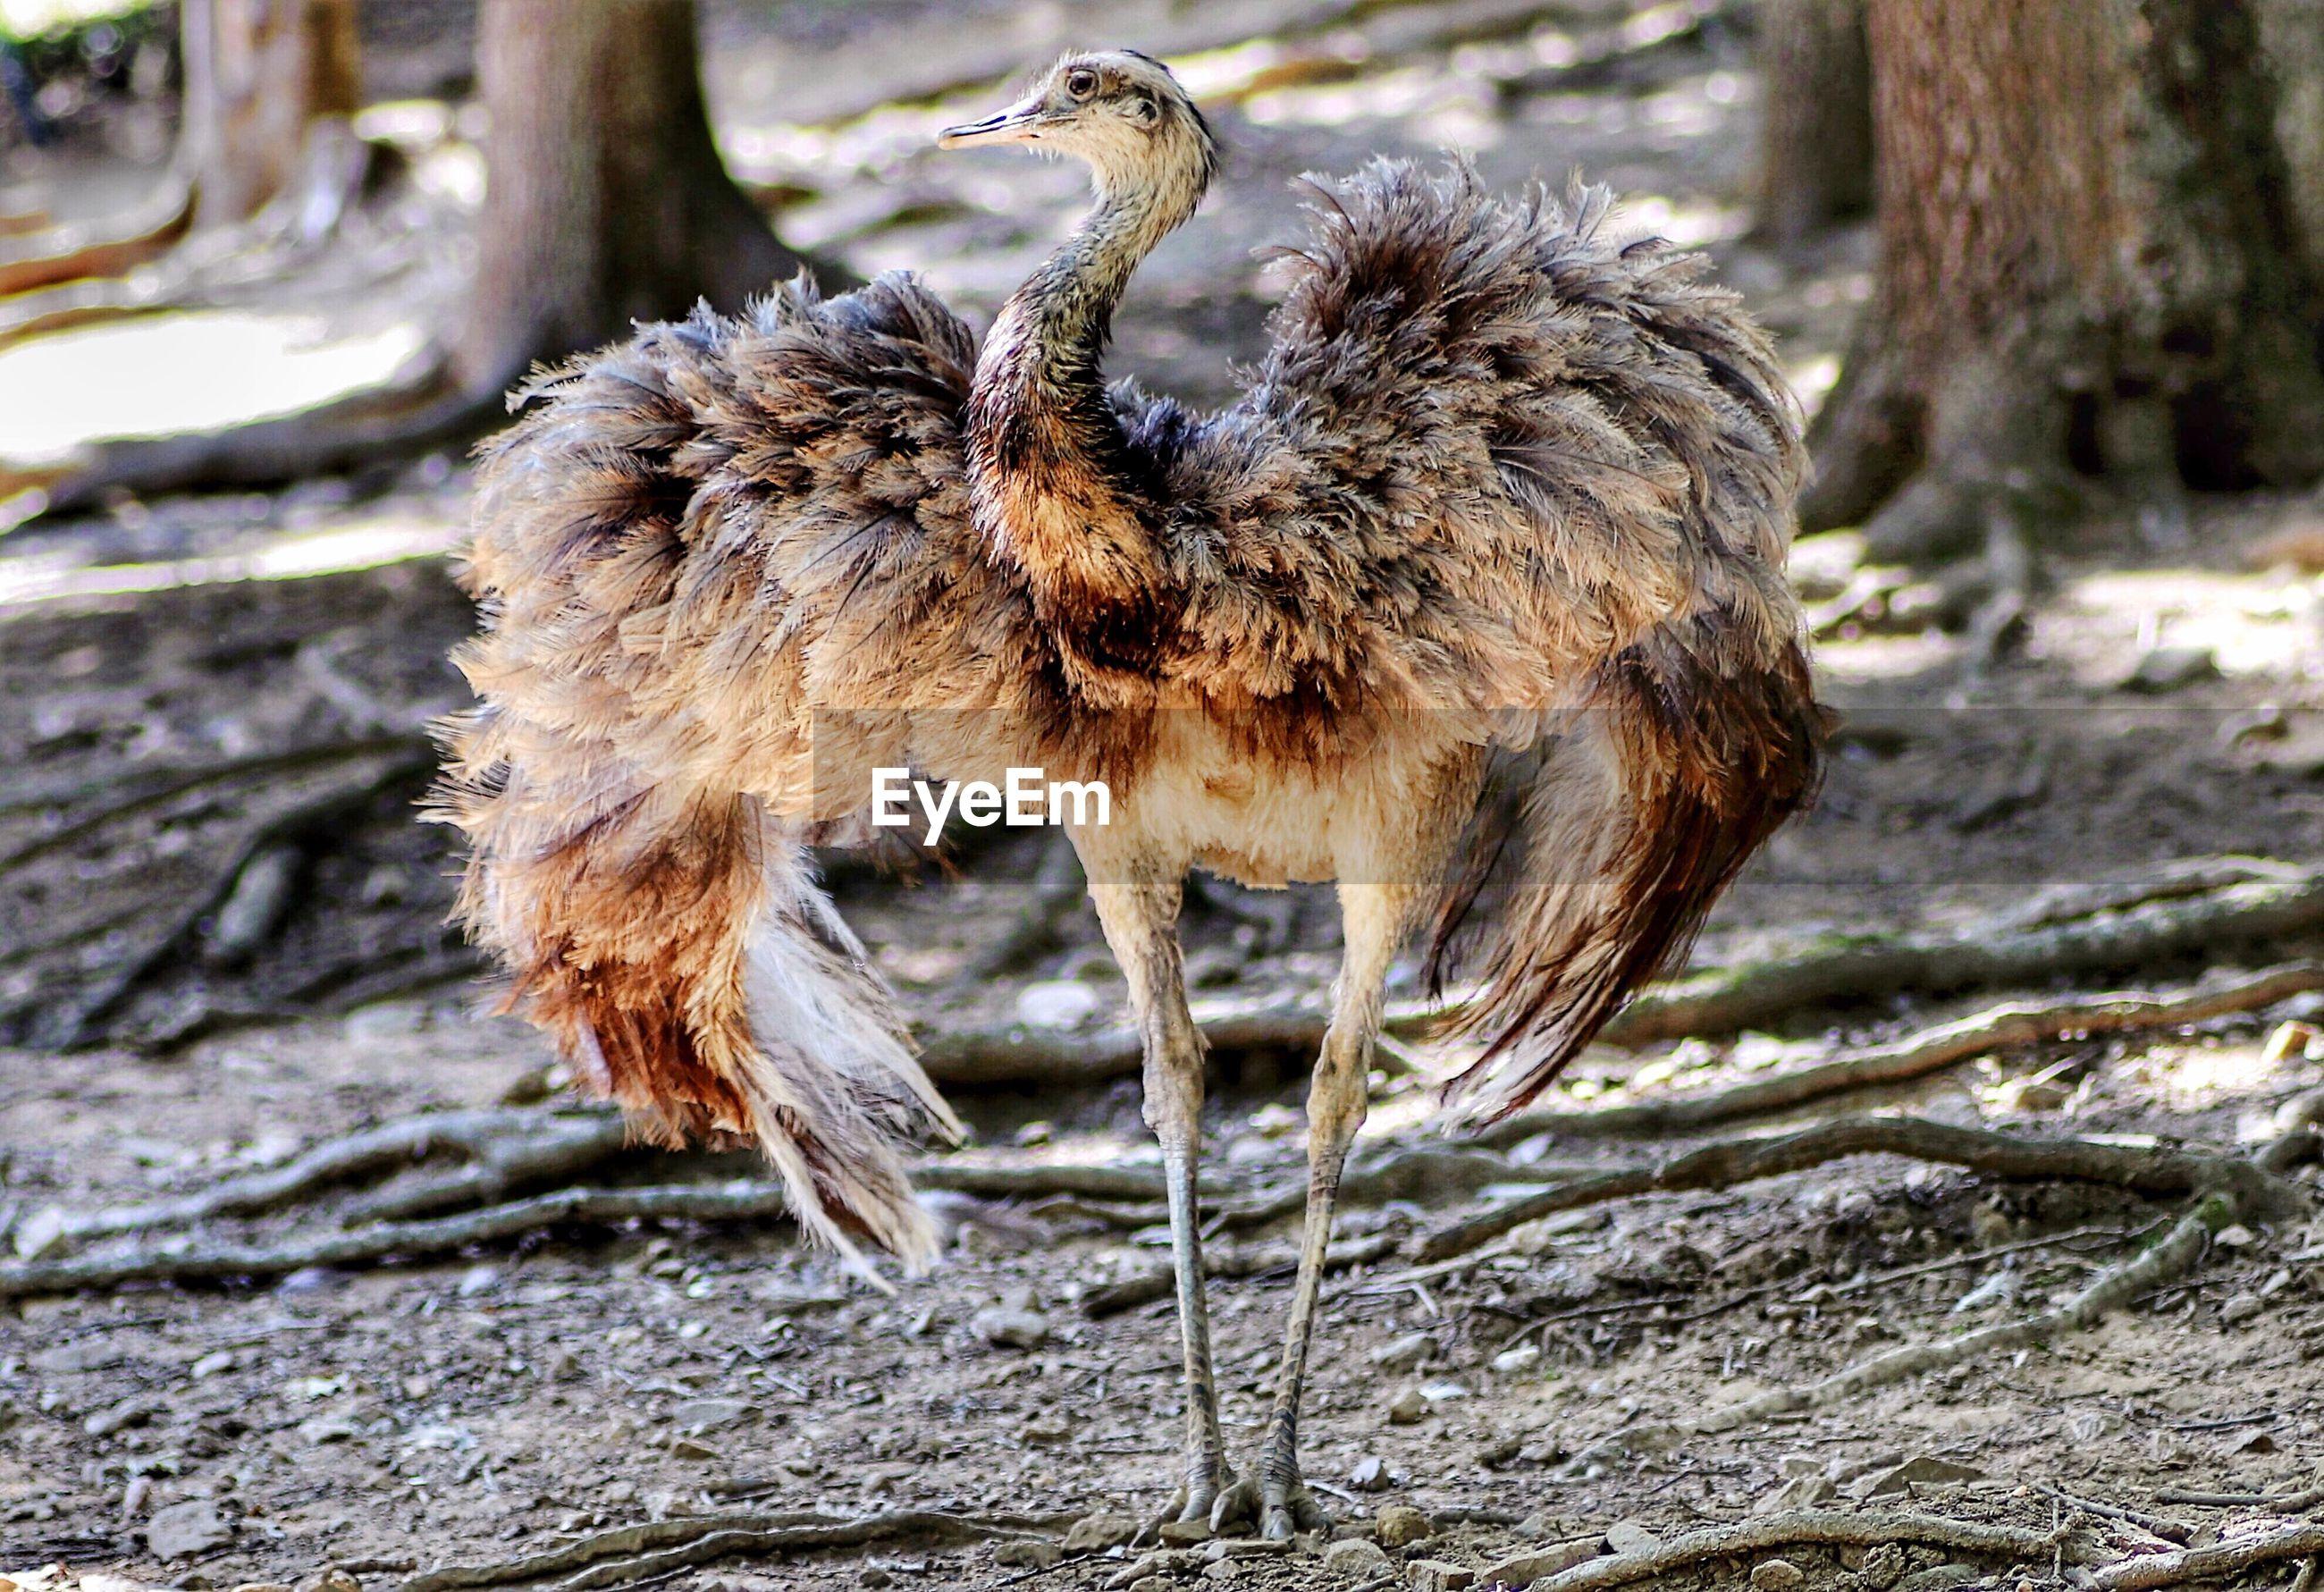 CLOSE-UP OF A BIRD ON NEST